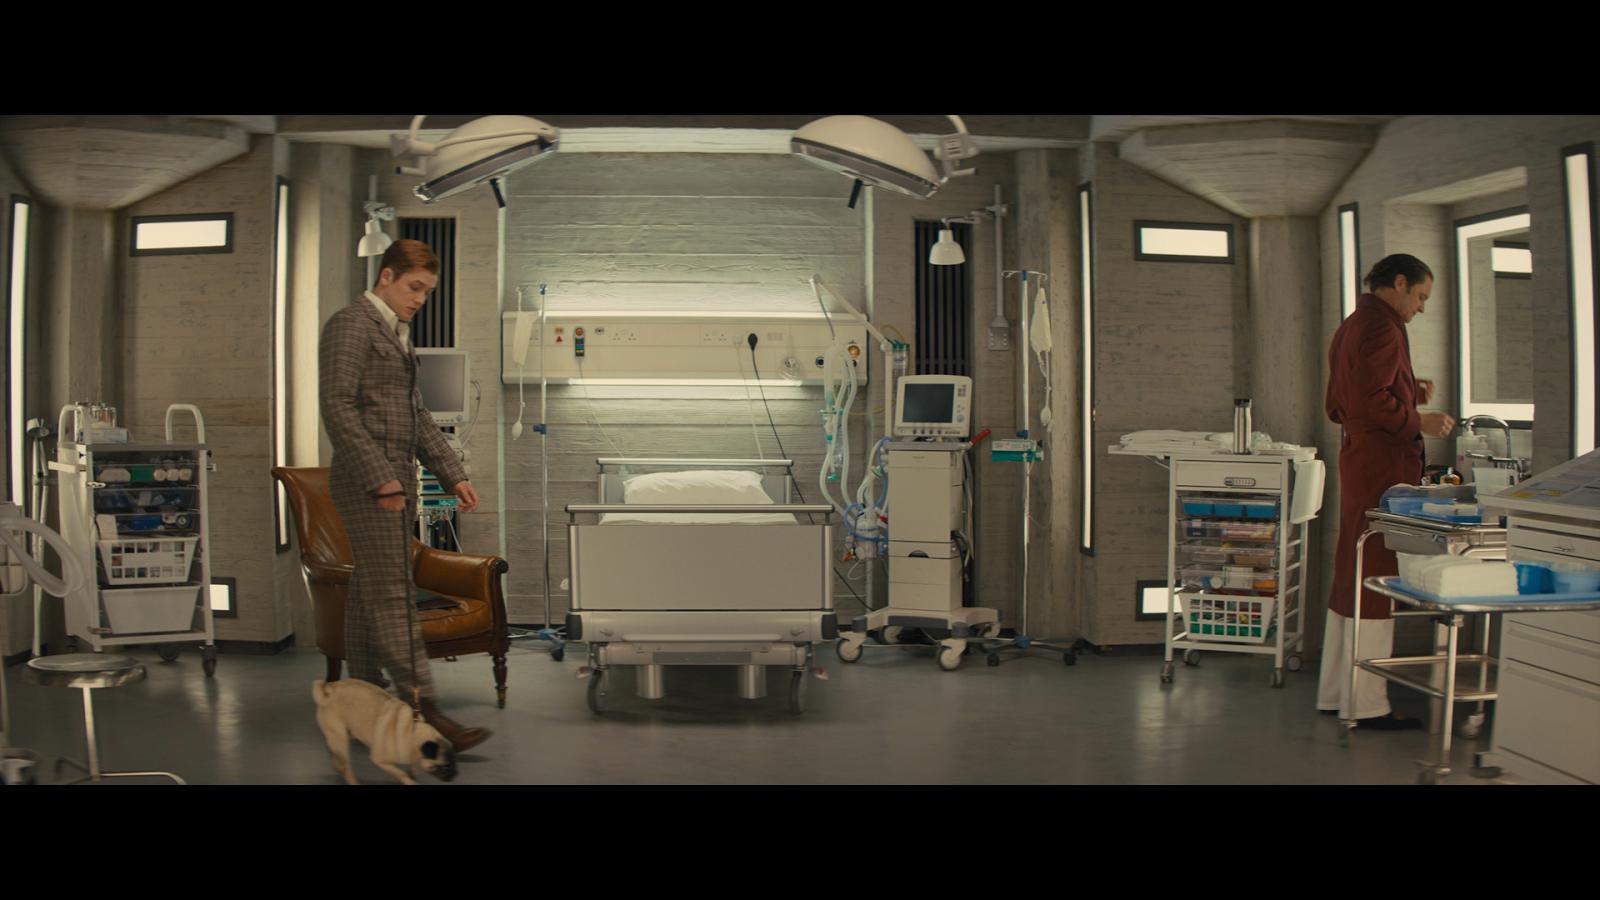 Kingsman El Servicio Secreto (2015) 1080p BD25 5